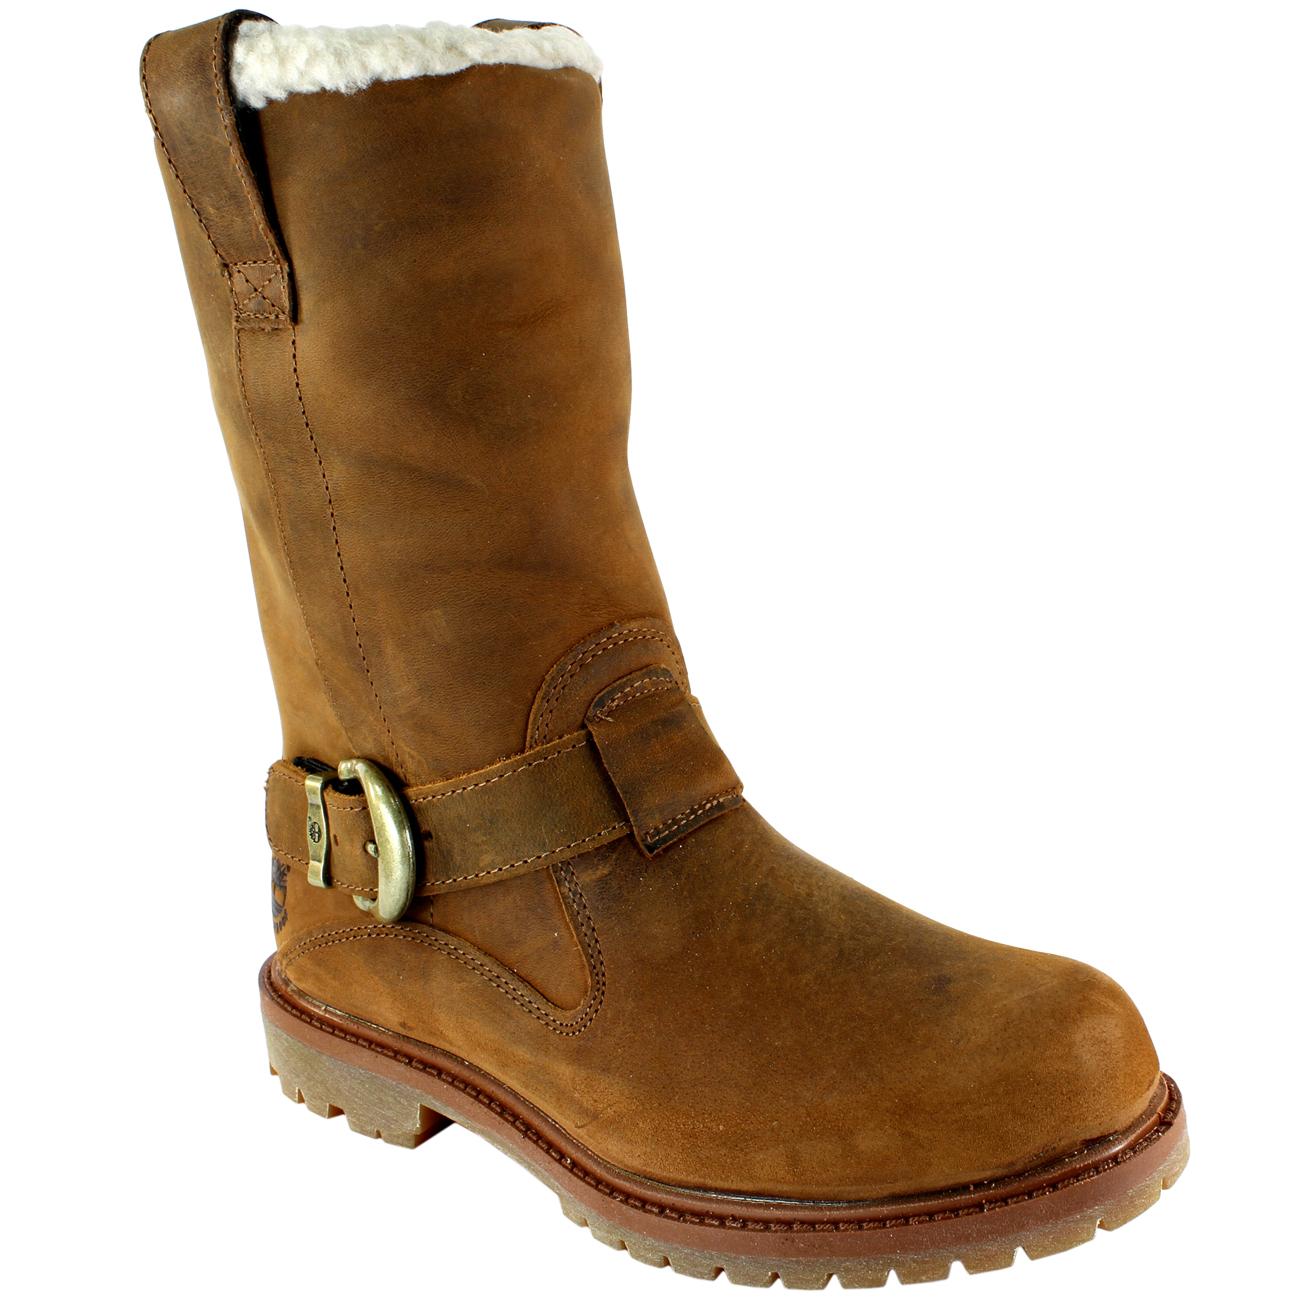 Delle Donne Timberland Nellie Stivali Invernali Impermeabile XGHSHMP